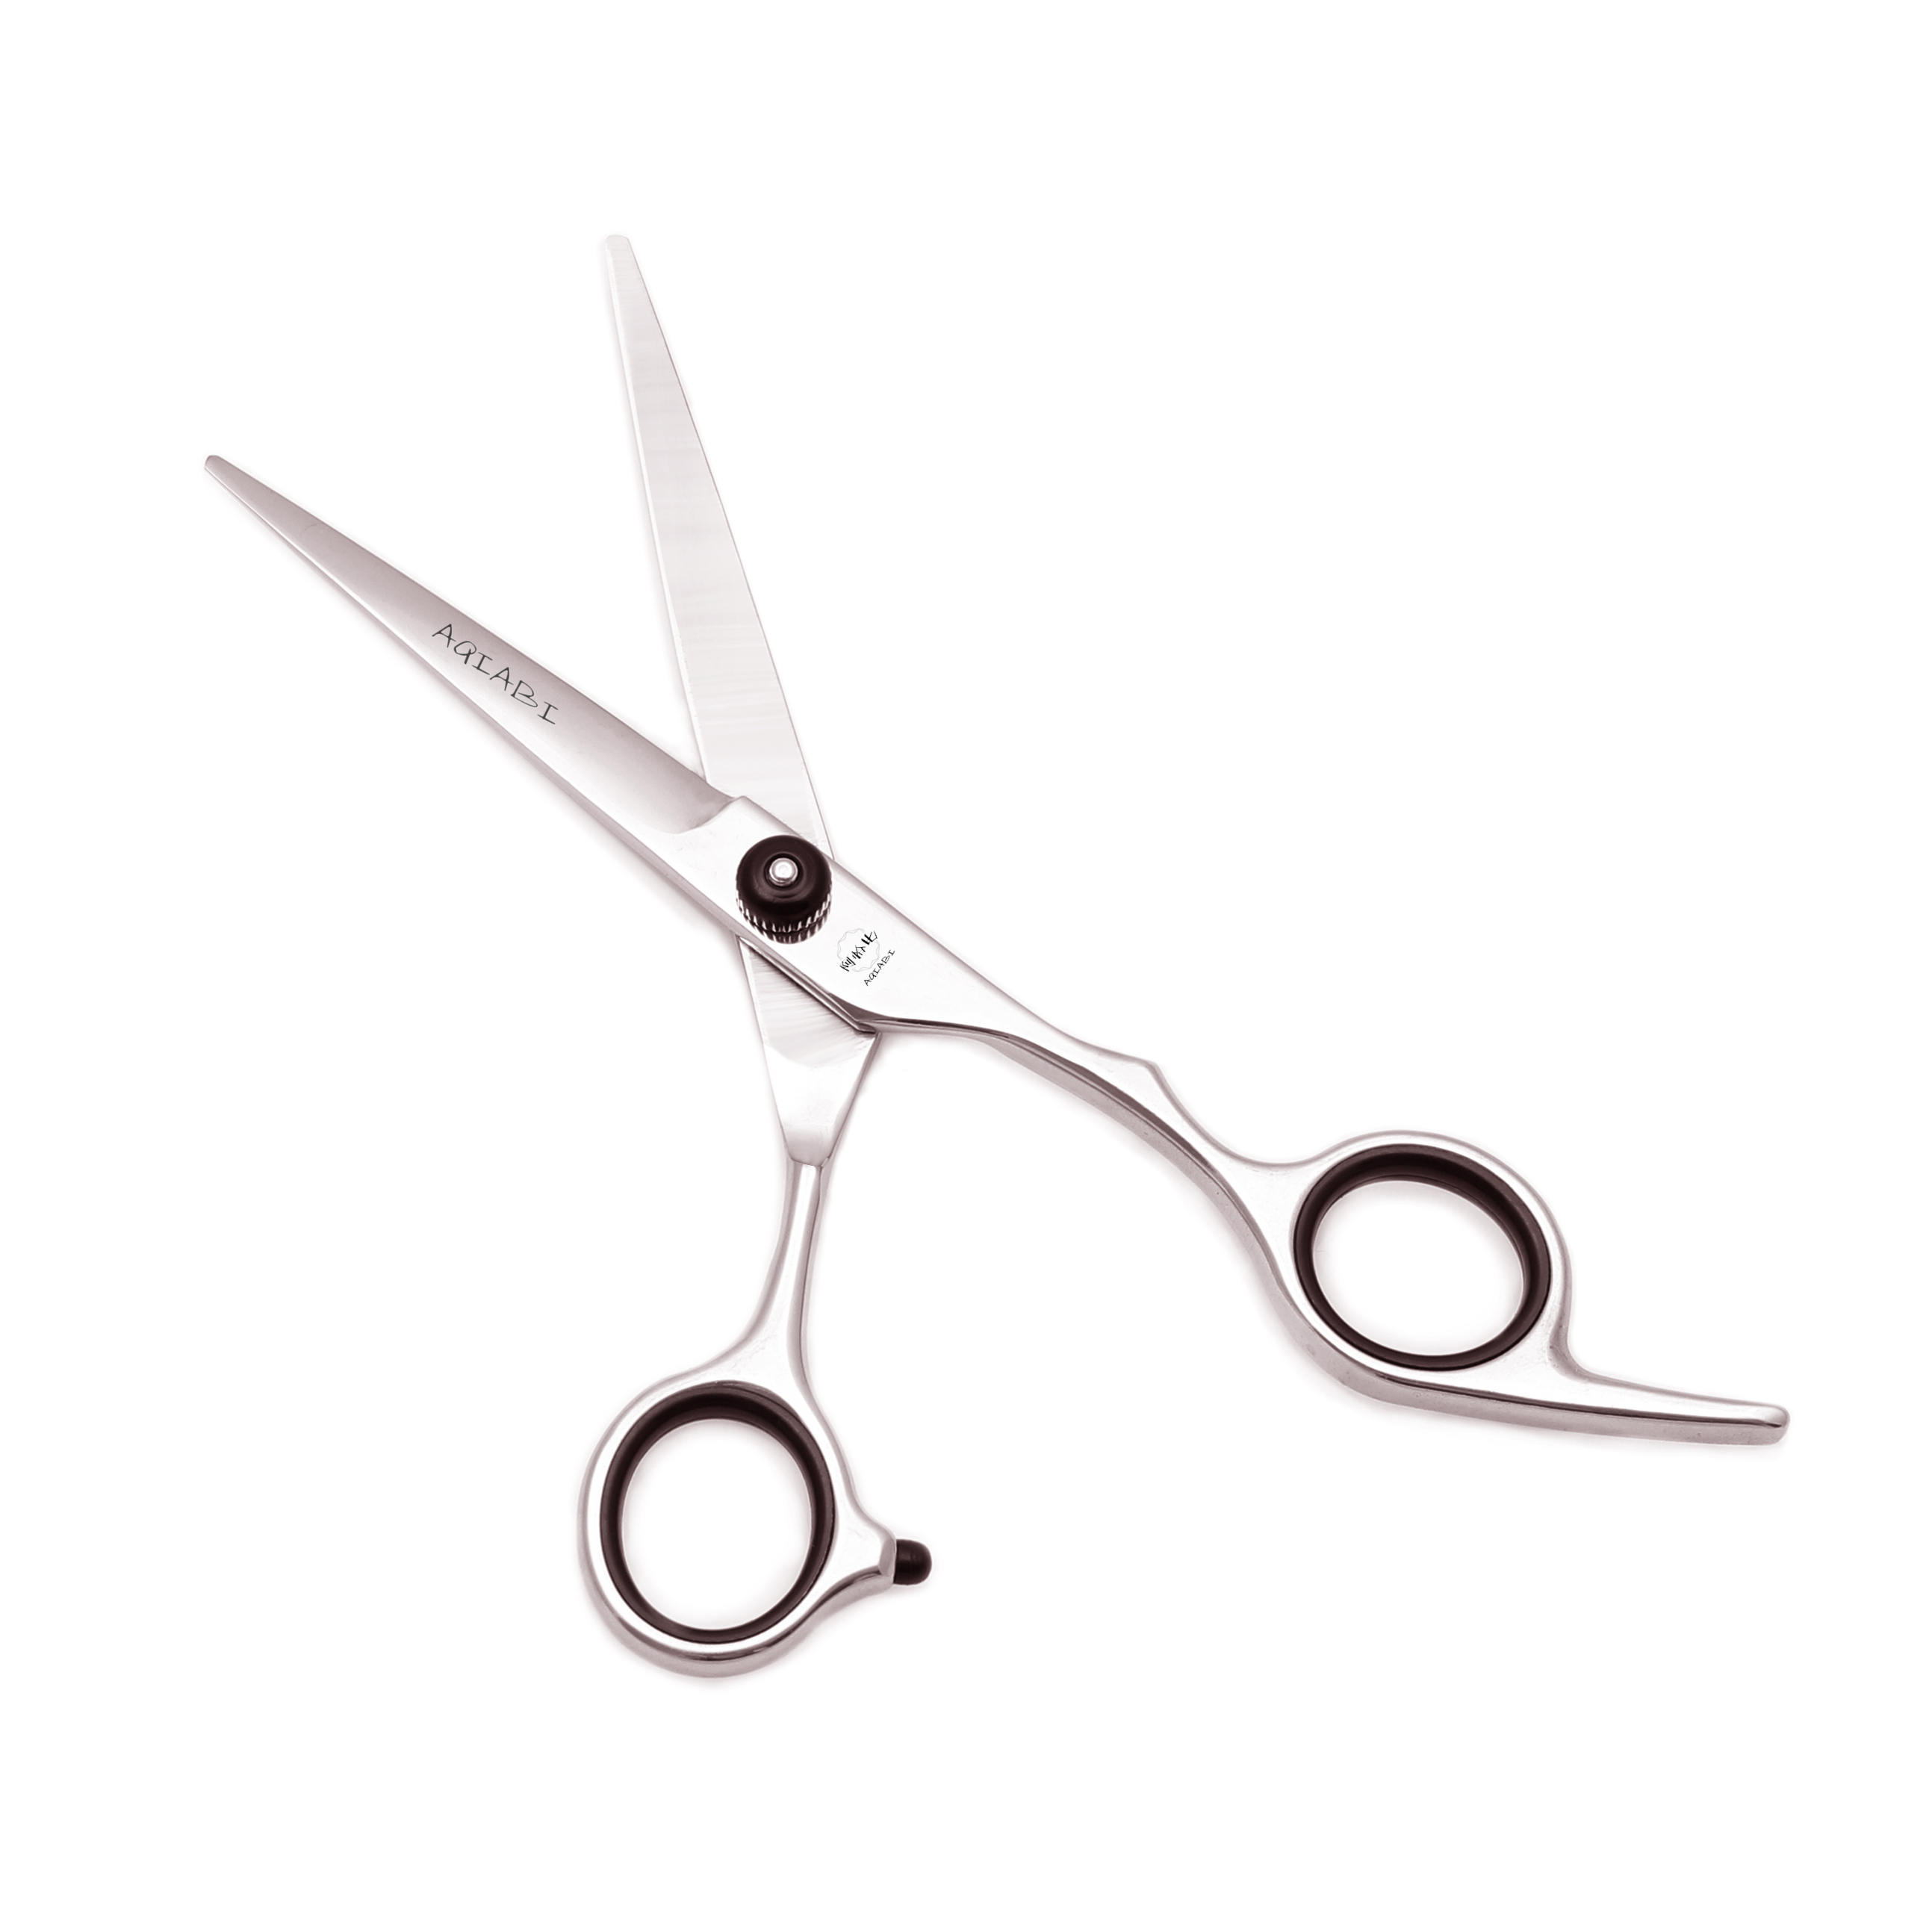 Hair Scissors Set 6' AQIABI Hair Cutting Scissors Thinning Shears Barber Scissors Set of Tool A1001-A